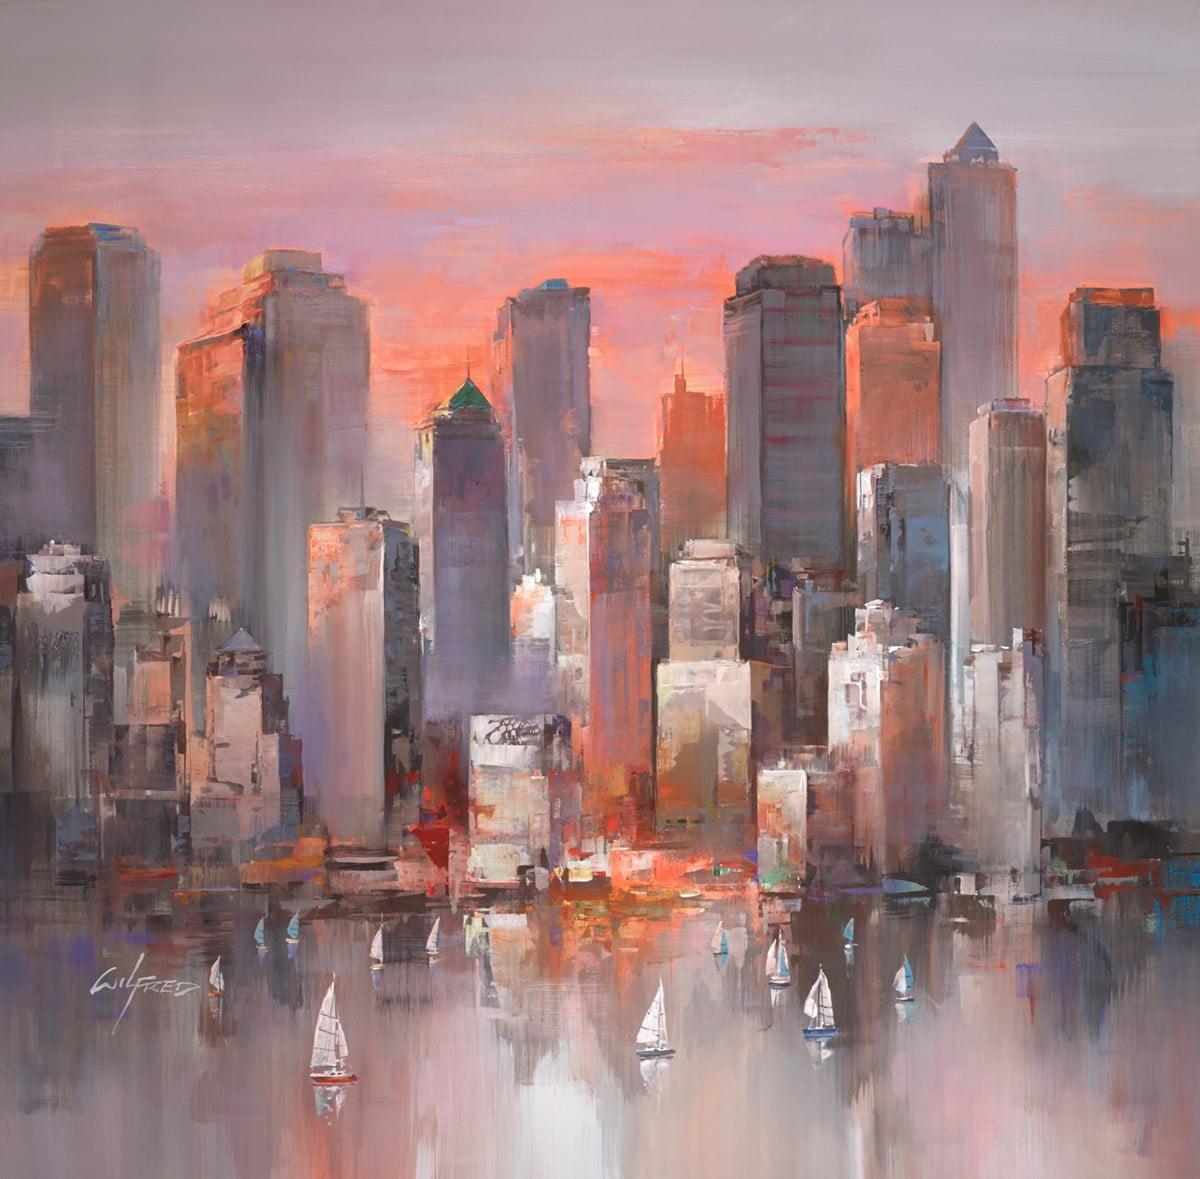 City Sundown II ~ Wilfred